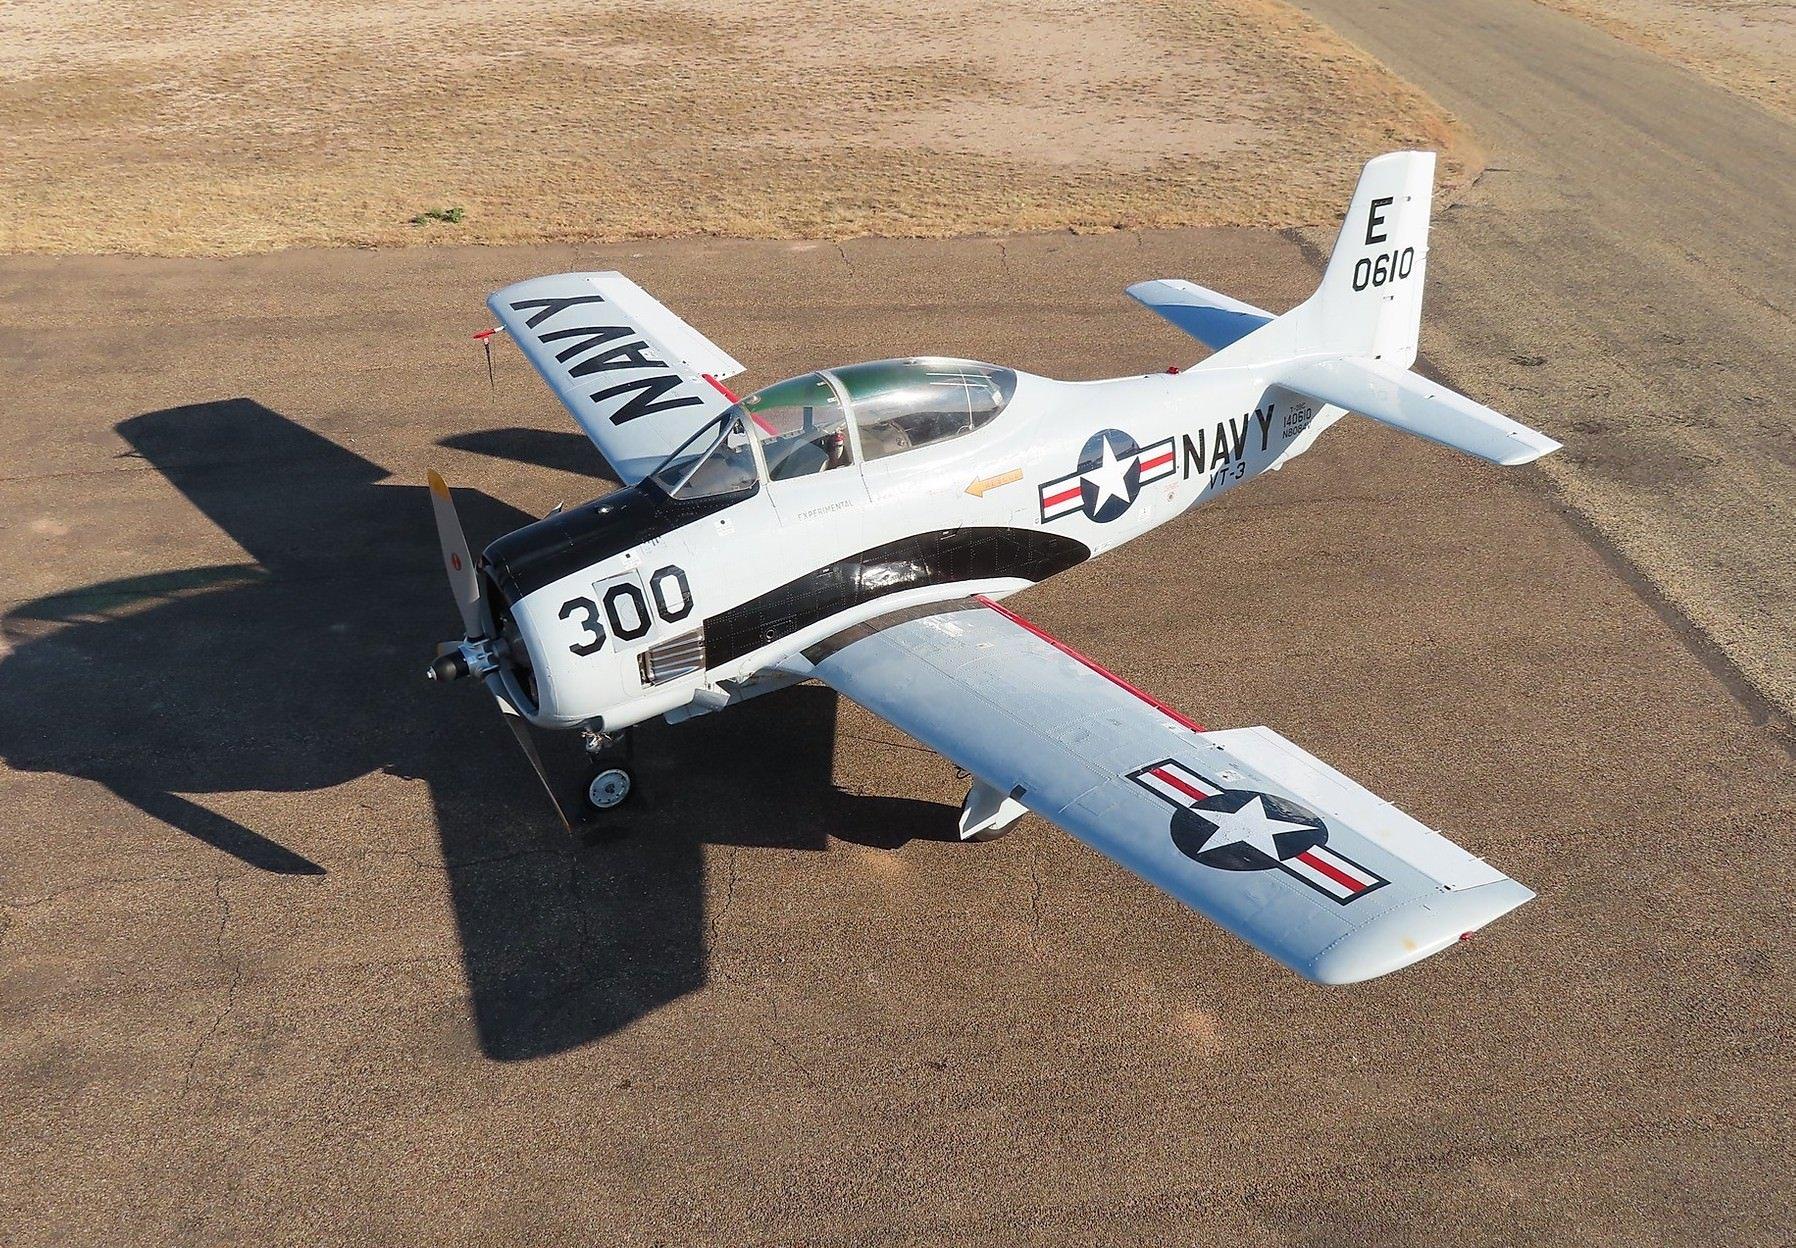 North American Aviation T-28 Overhead